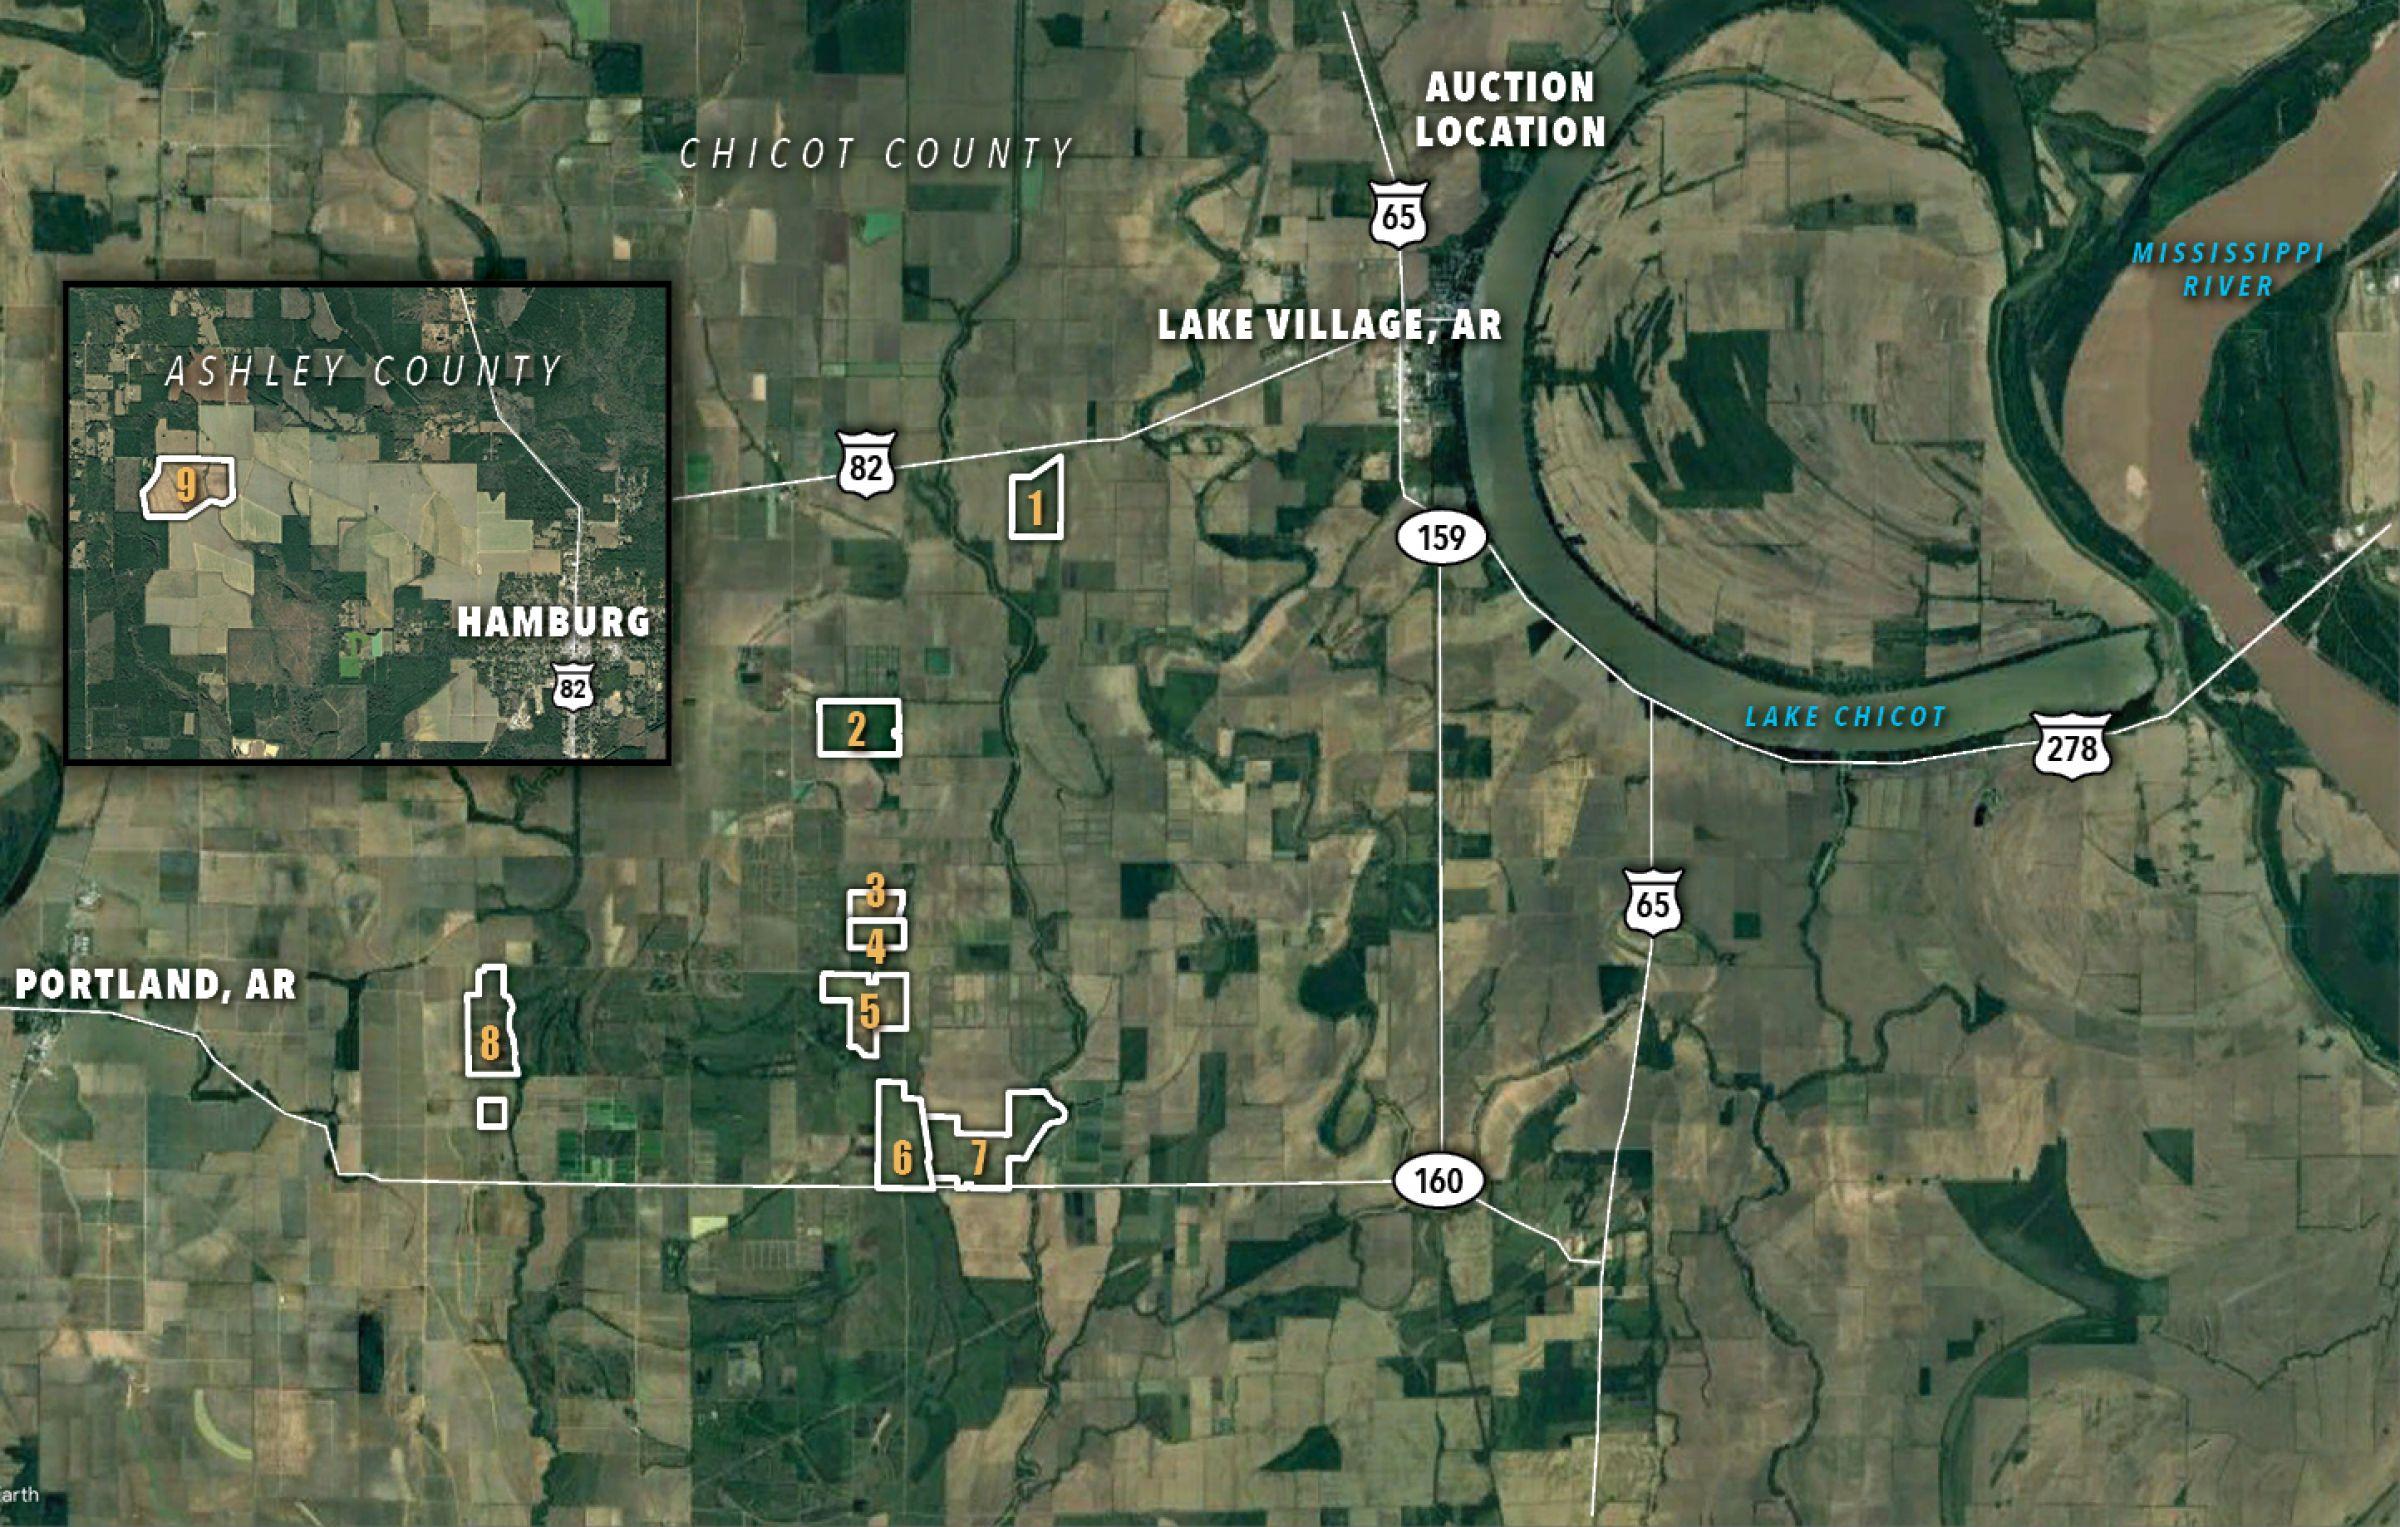 4-jennie-cutoff-road-lake-village-71653-71654-0-2021-06-09-200321.jpg